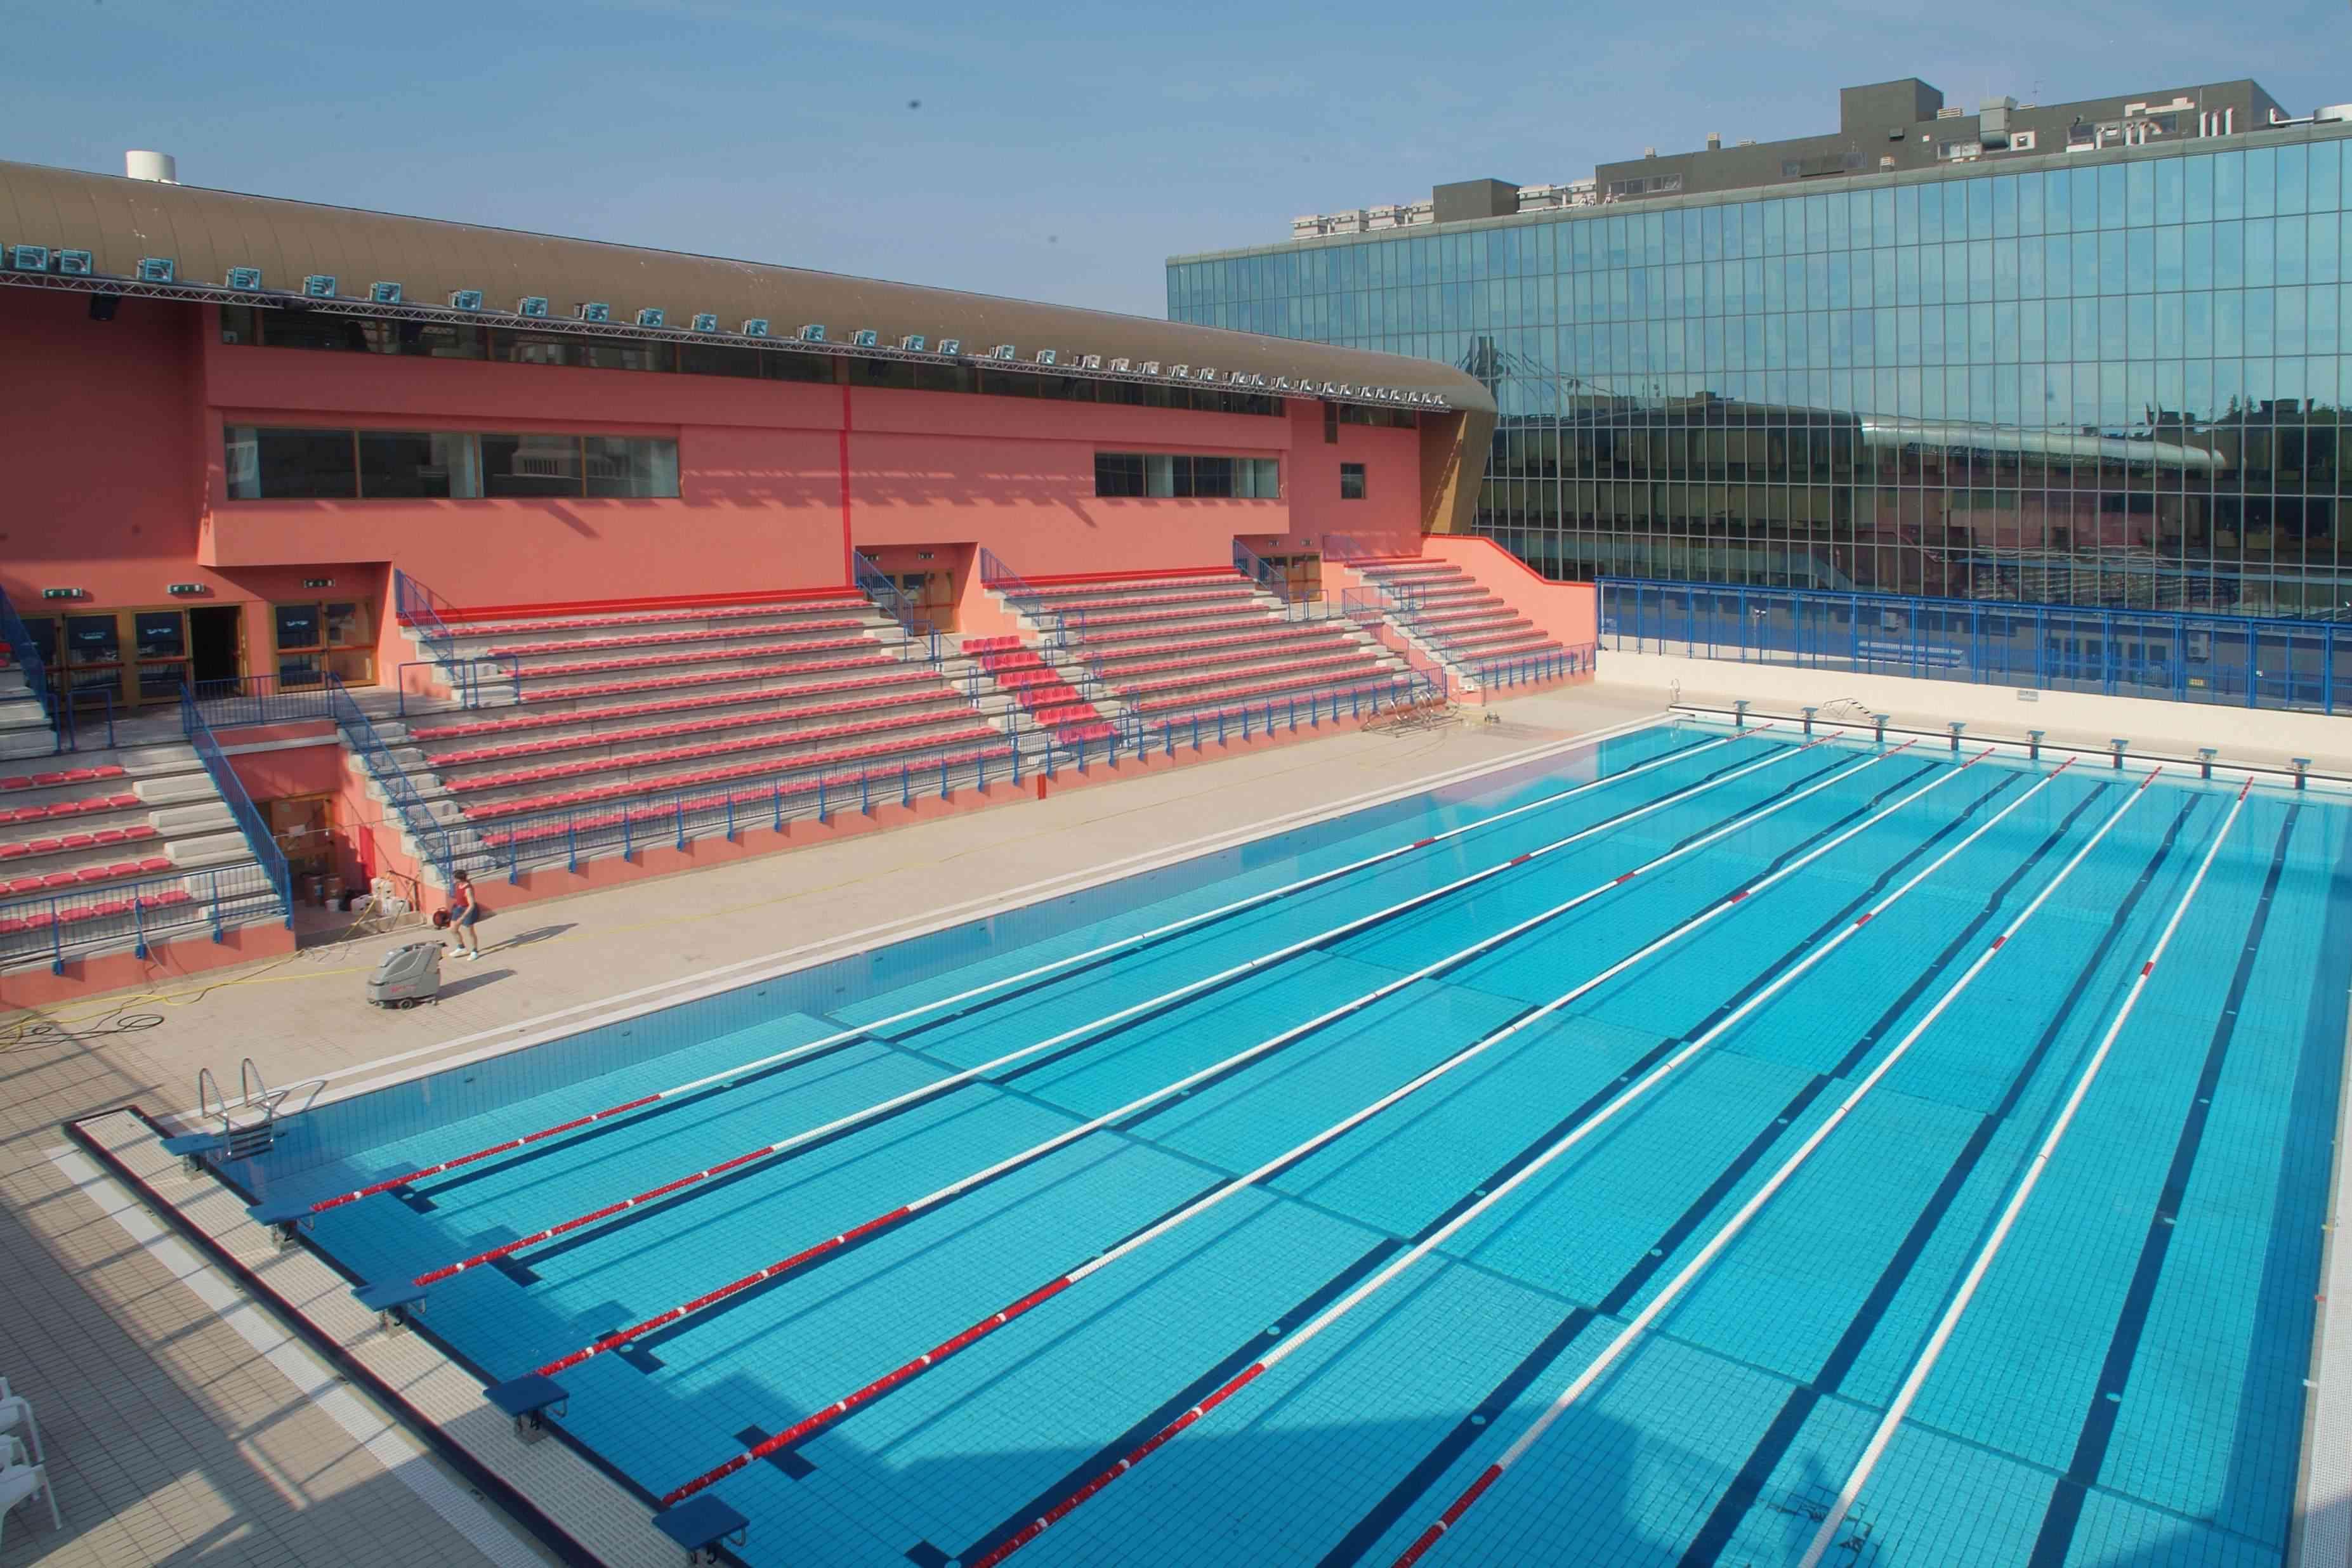 Prezzi e orari piscina scoperta piscina bianchi trieste - Orari piscina dalmine ...